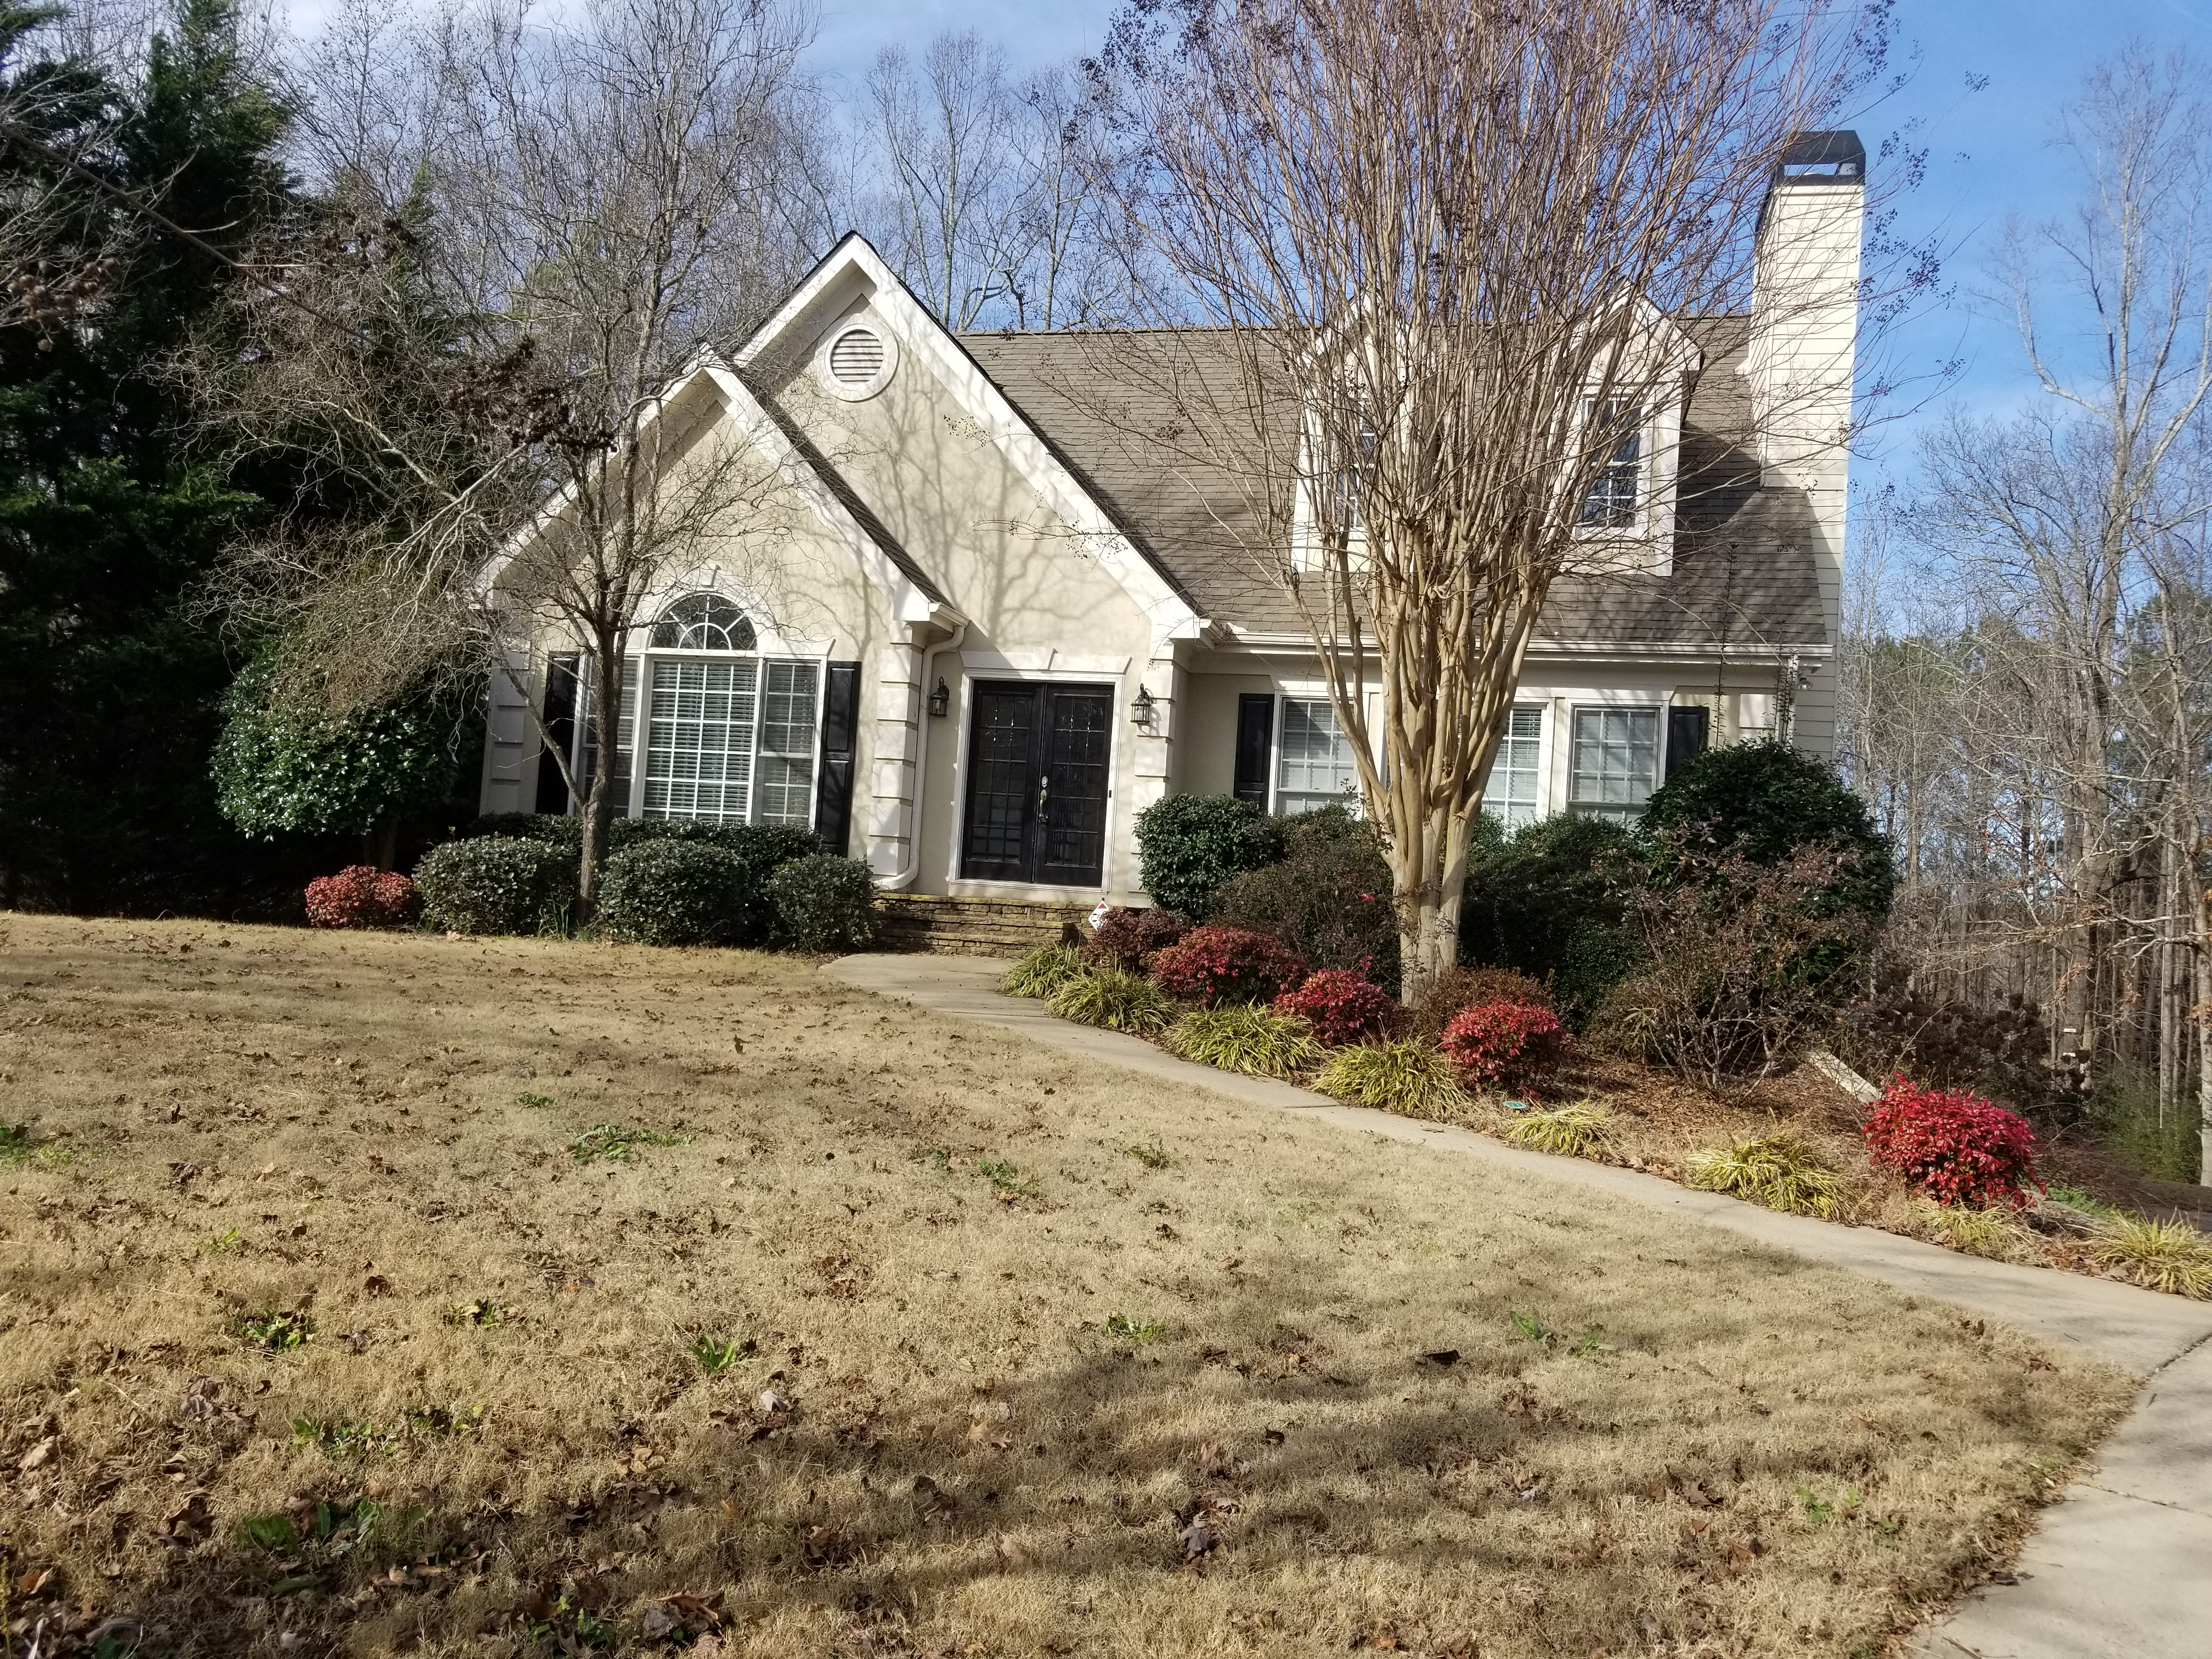 Photo of 4960 Ansley Ln, Cumming, GA, 30040